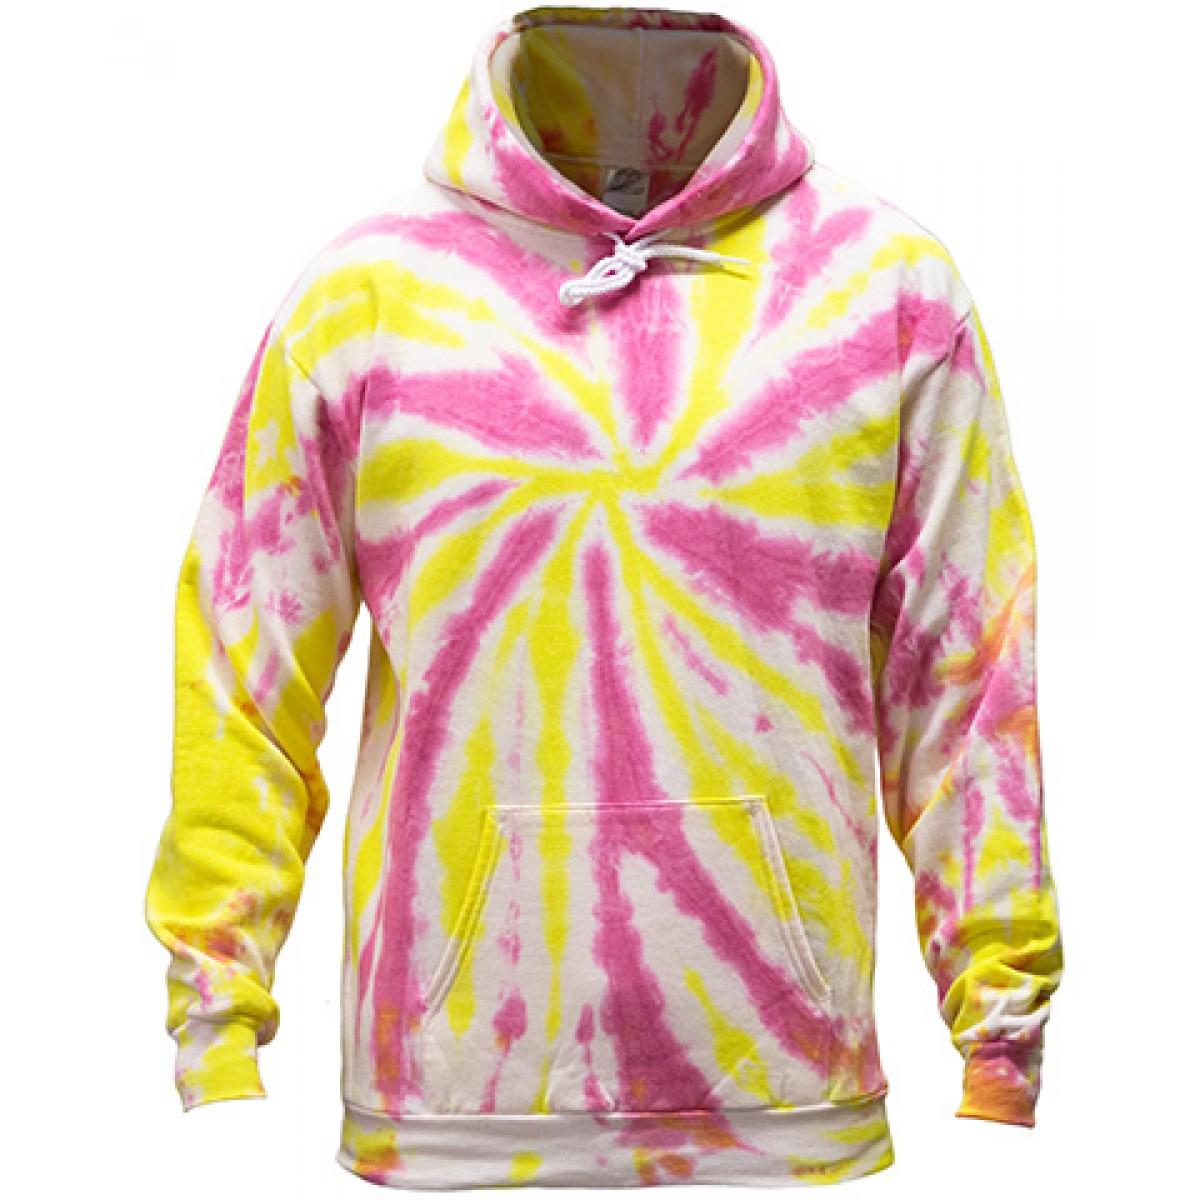 Tie-Dye Pullover Hooded Sweatshirt-Pink/Yellow-XL